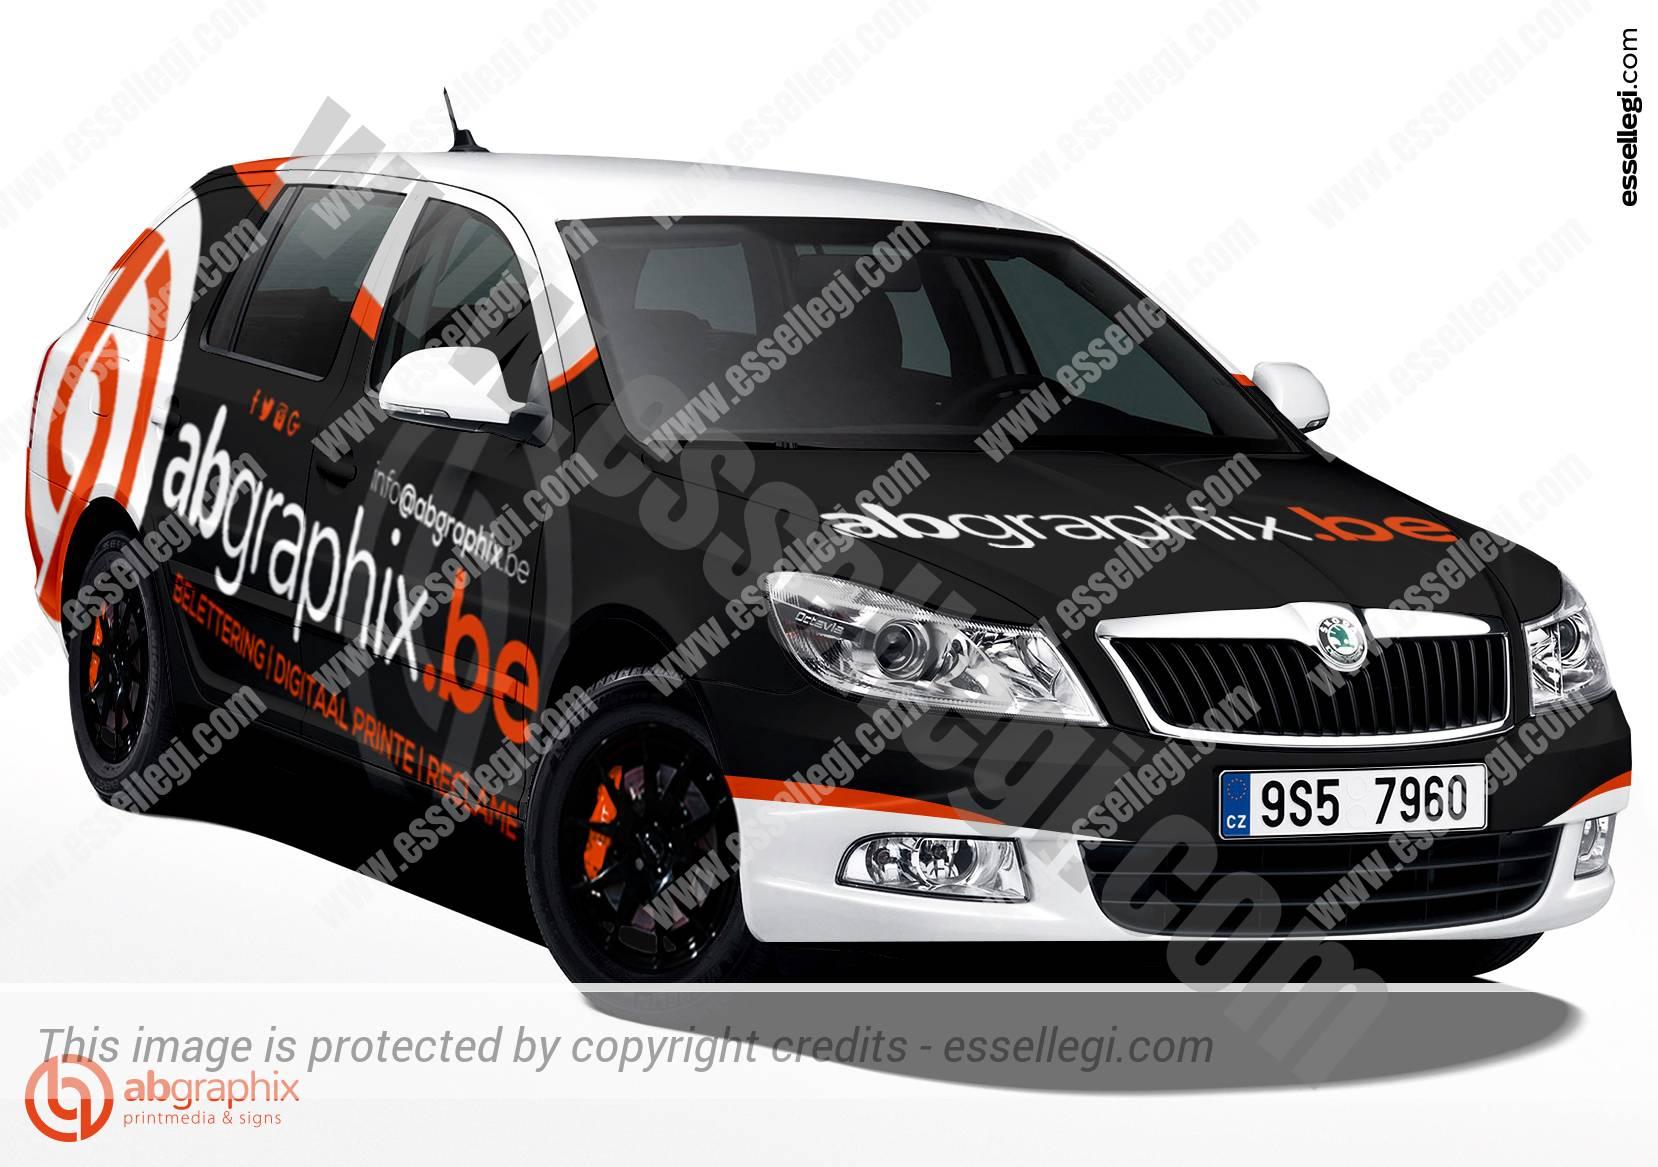 Skoda Octavia Car Wrap Design By Essellegi